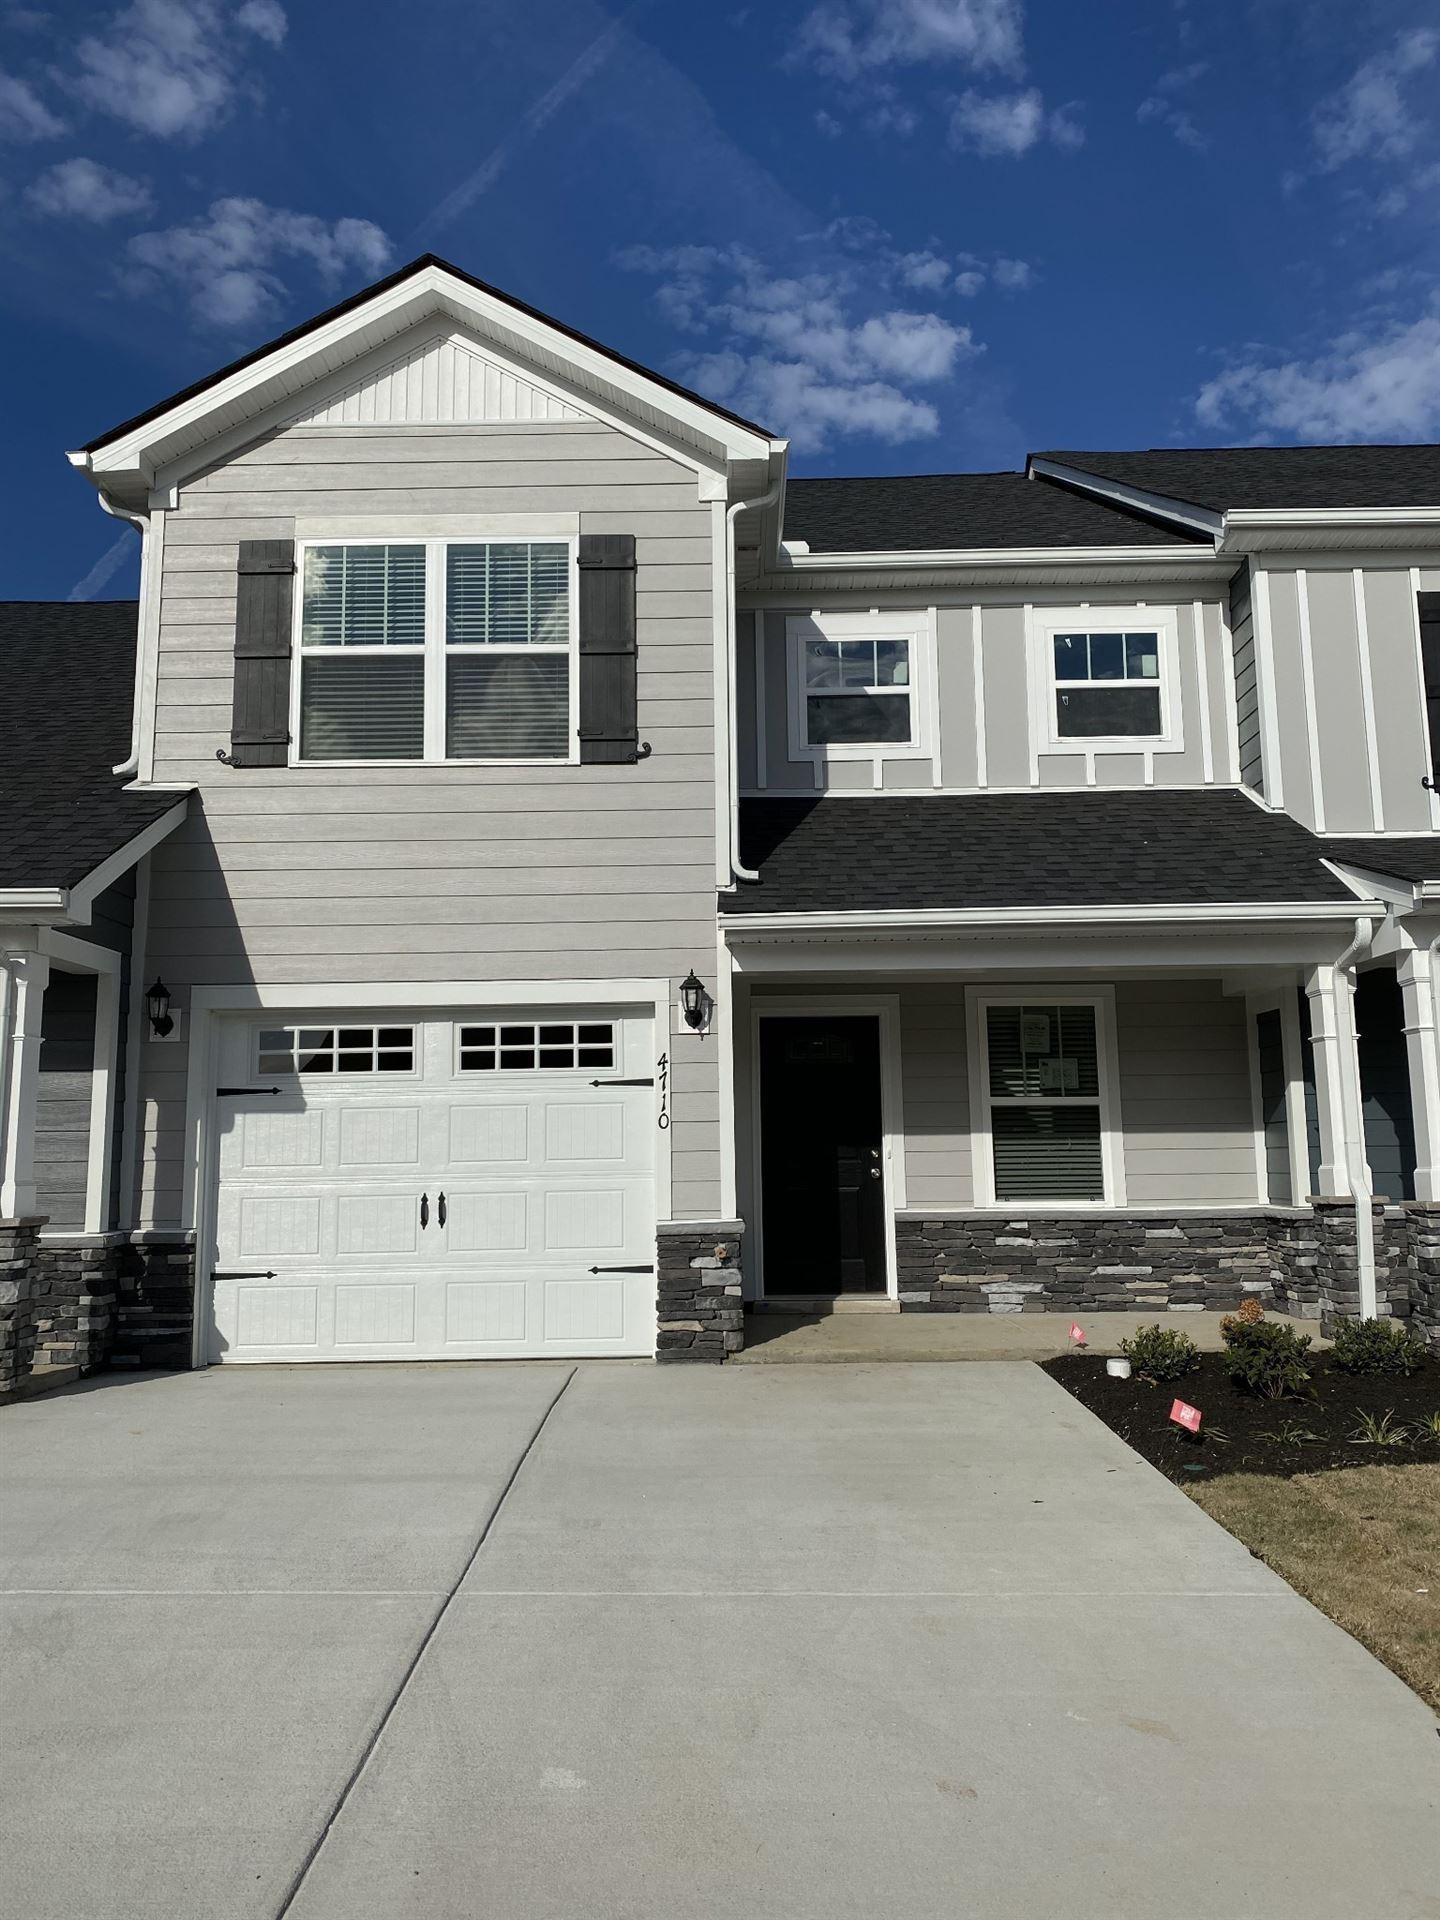 1641 Calypso Drive Lot 59 #59, Murfreesboro, TN 37128 - MLS#: 2206791